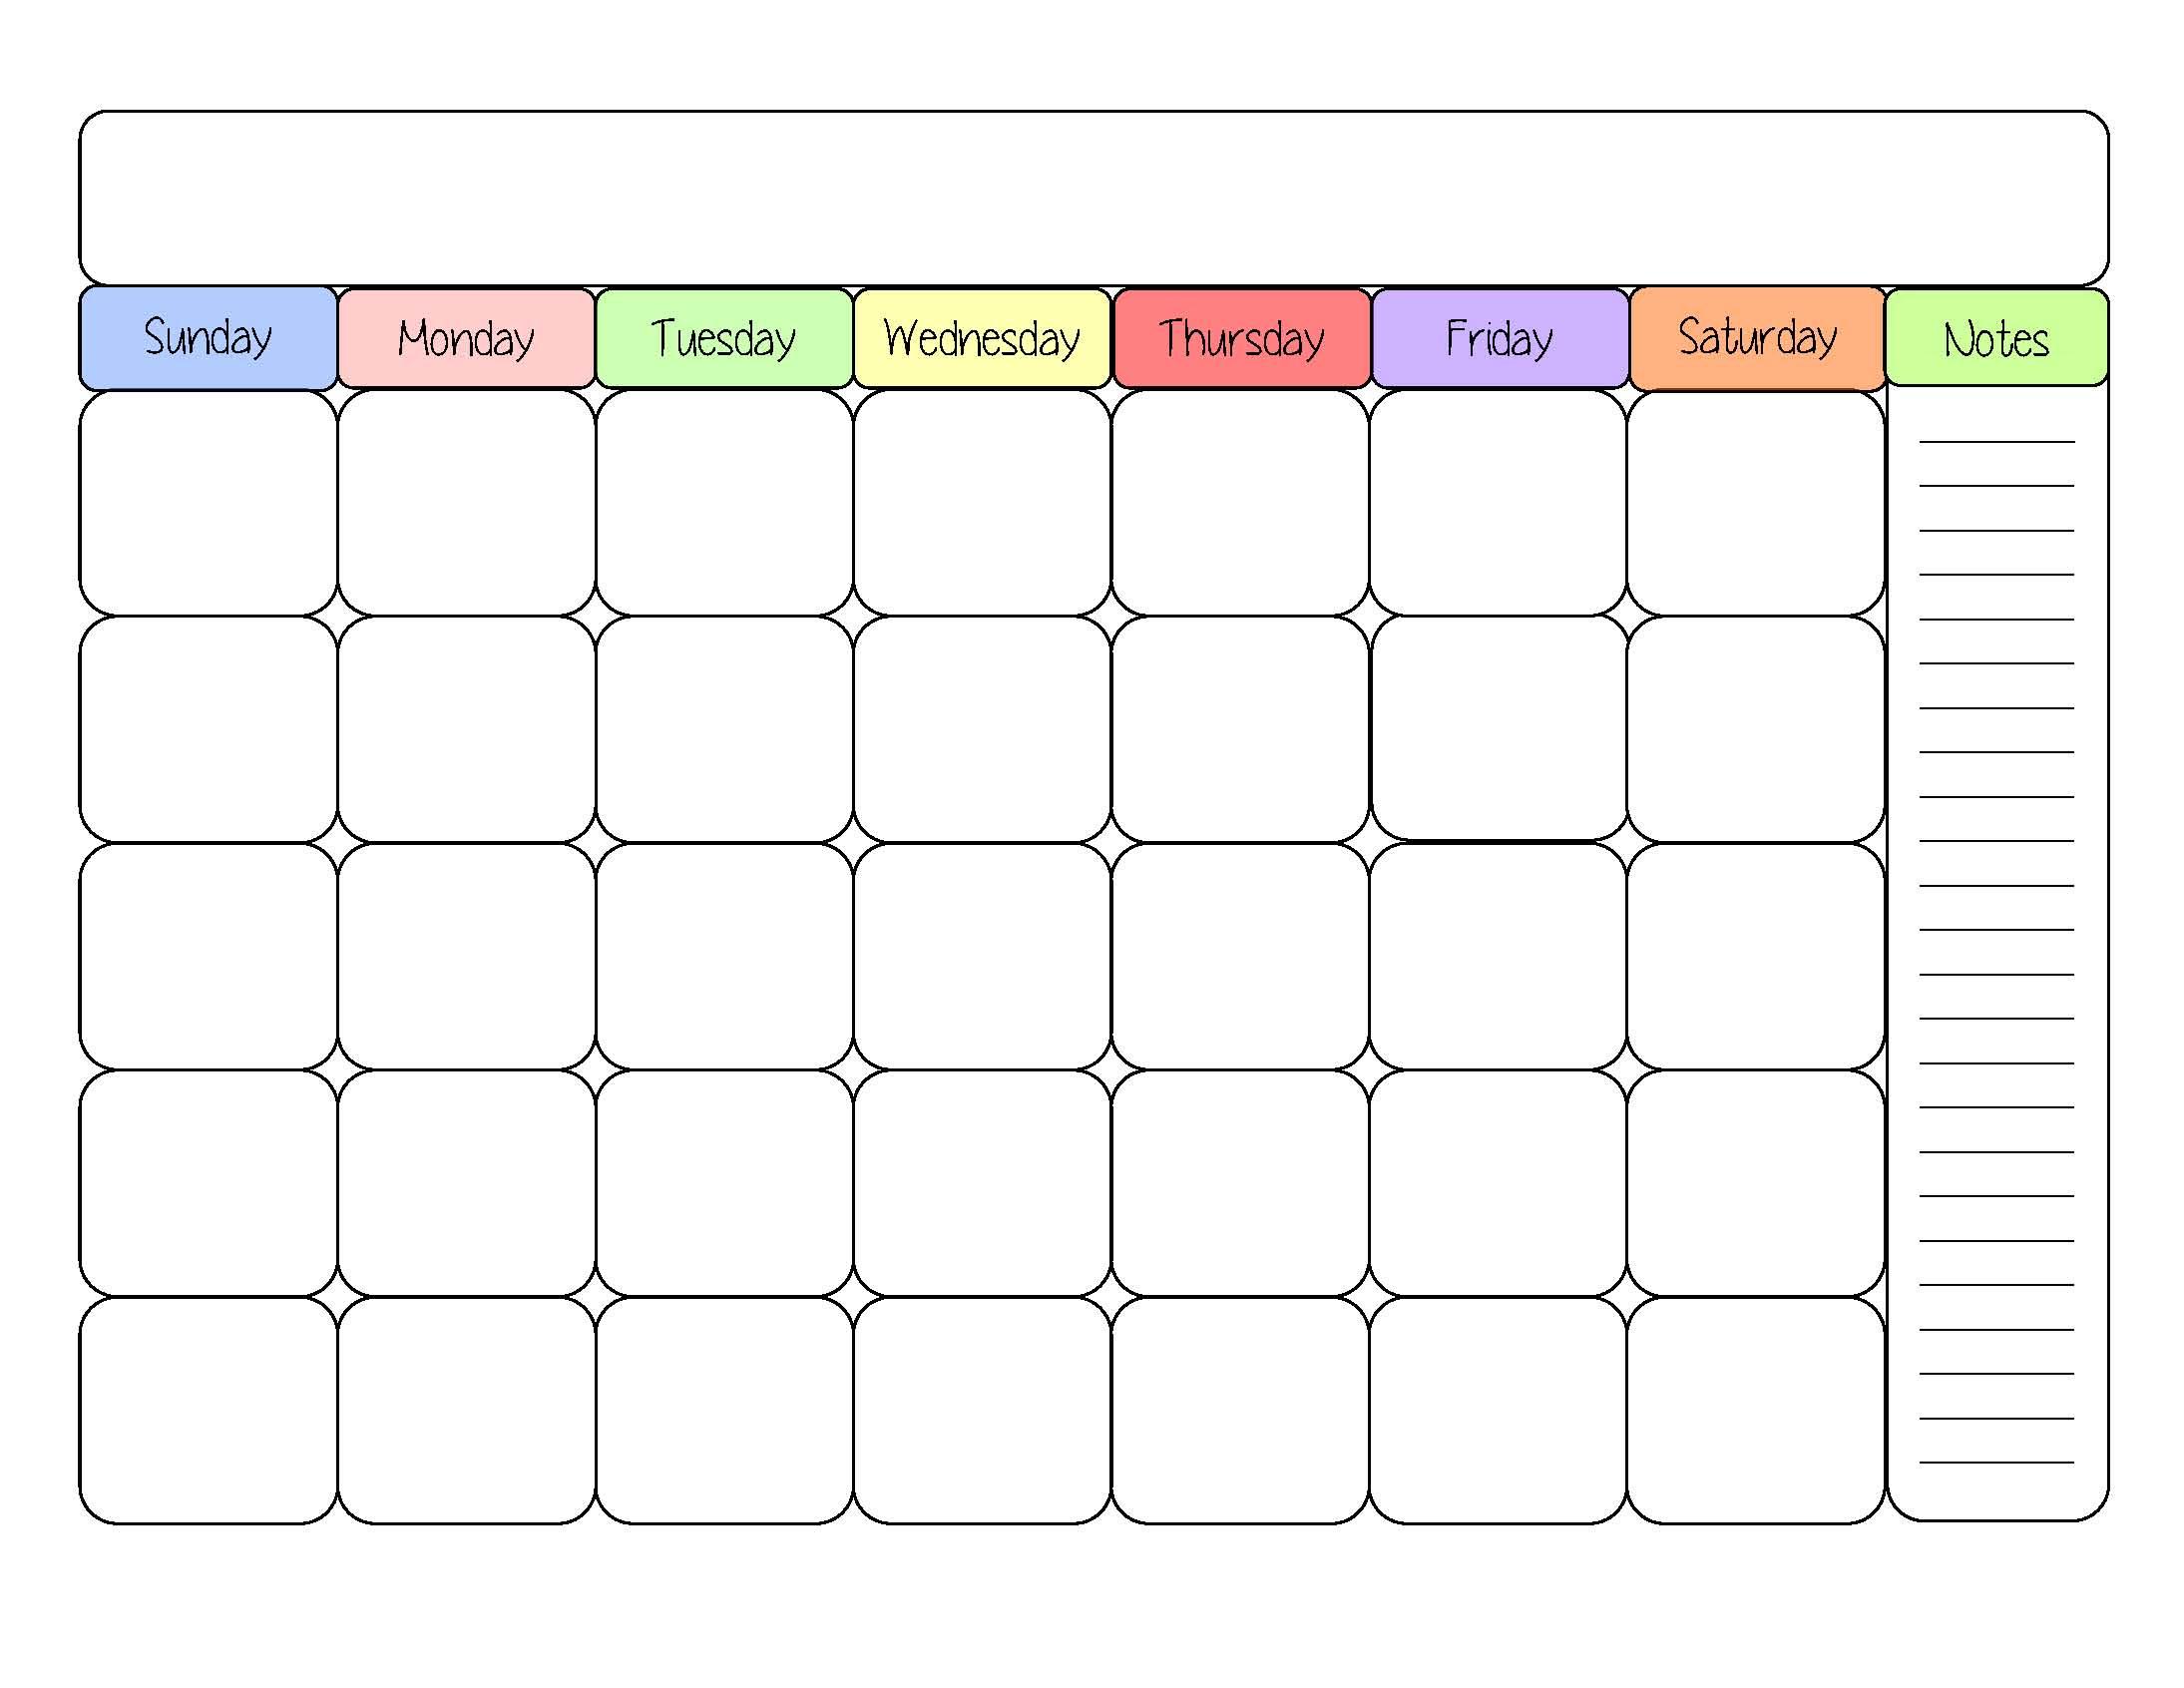 Calendar Template To Print | printable calendar templates